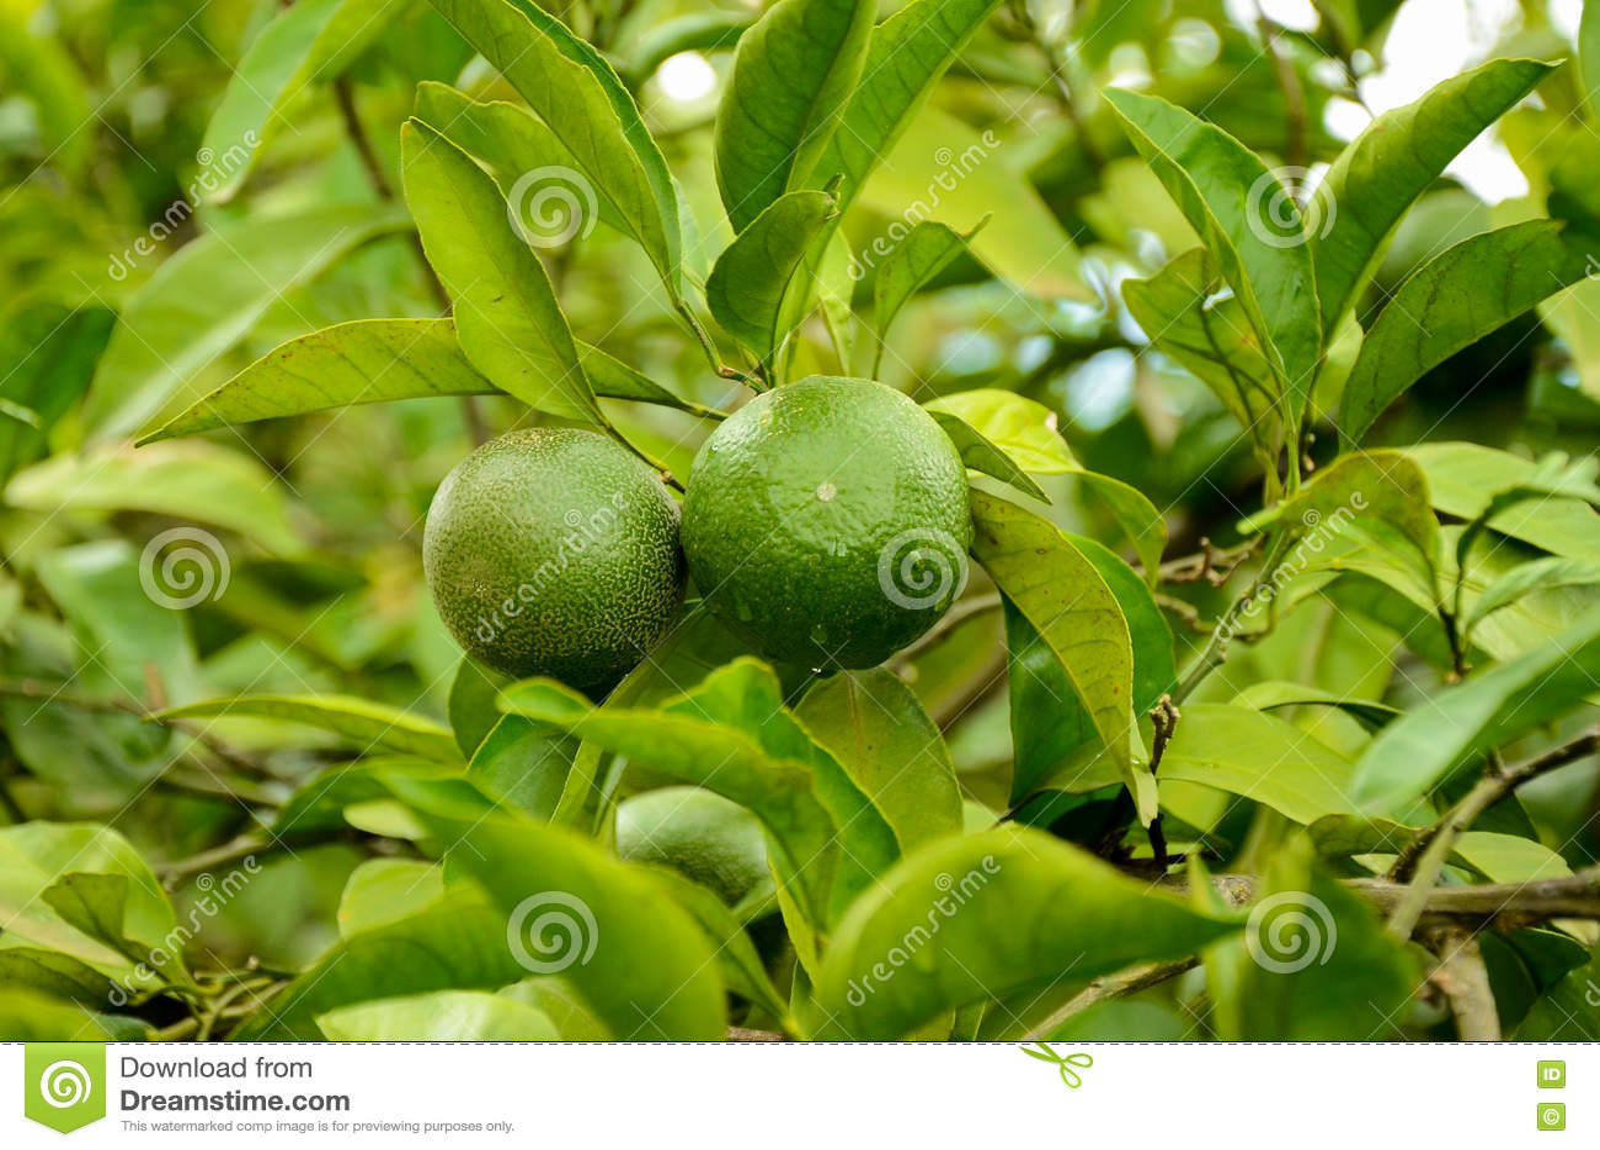 Mandarino verde non maturo, mandarino sulla pianta